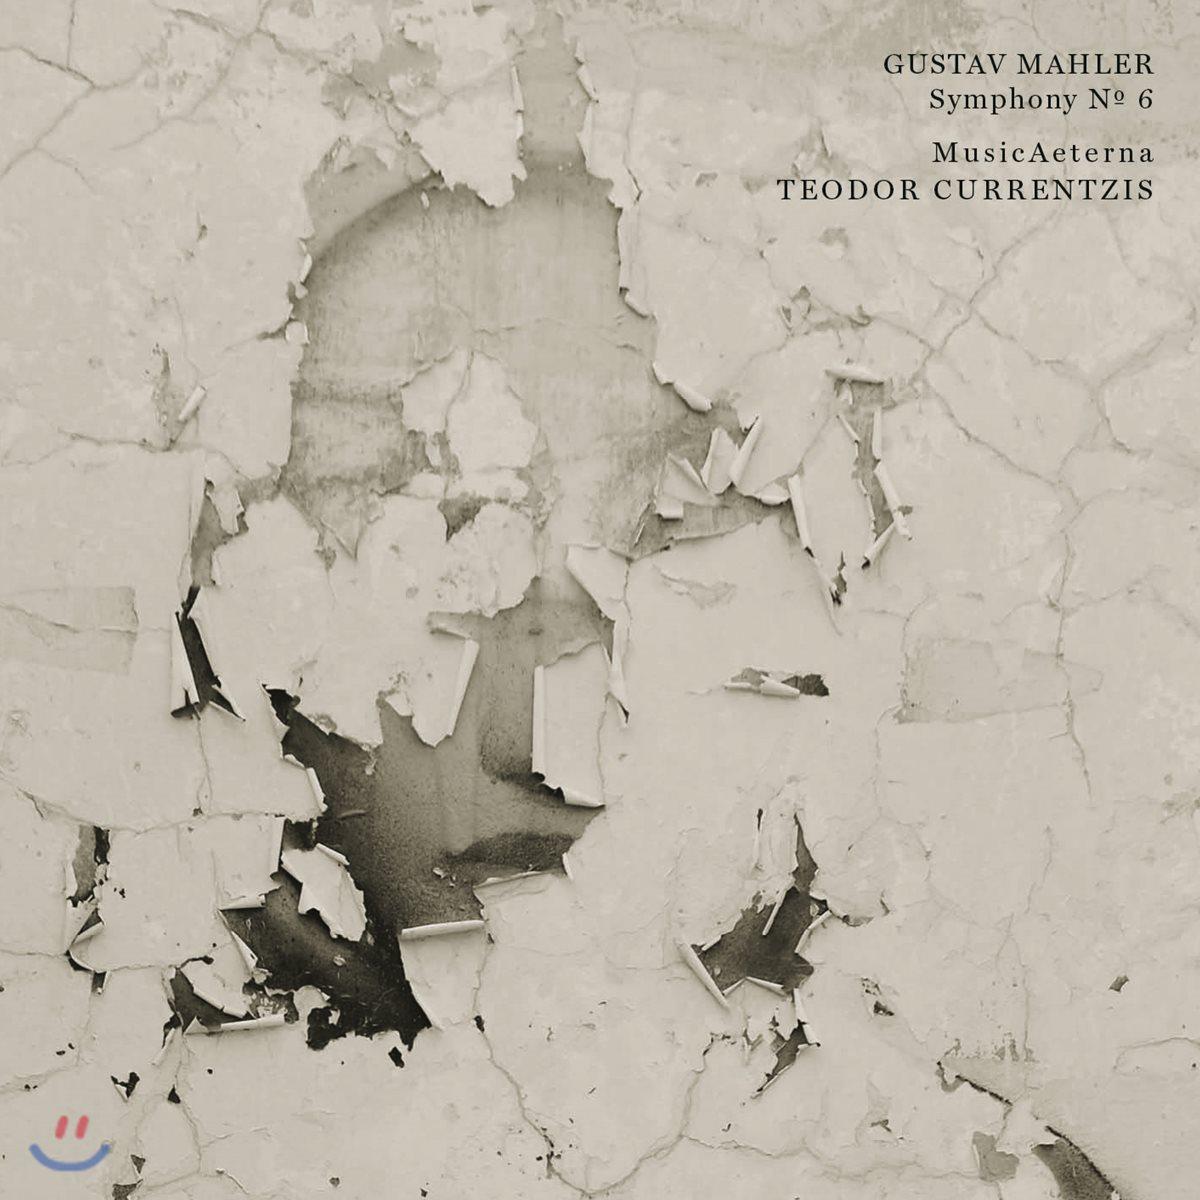 Teodor Currentzis 말러: 교향곡 6번 `비극적` - 테오도르 쿠렌치스 (Mahler: Symphony No.6 in a minor 'Tragic')